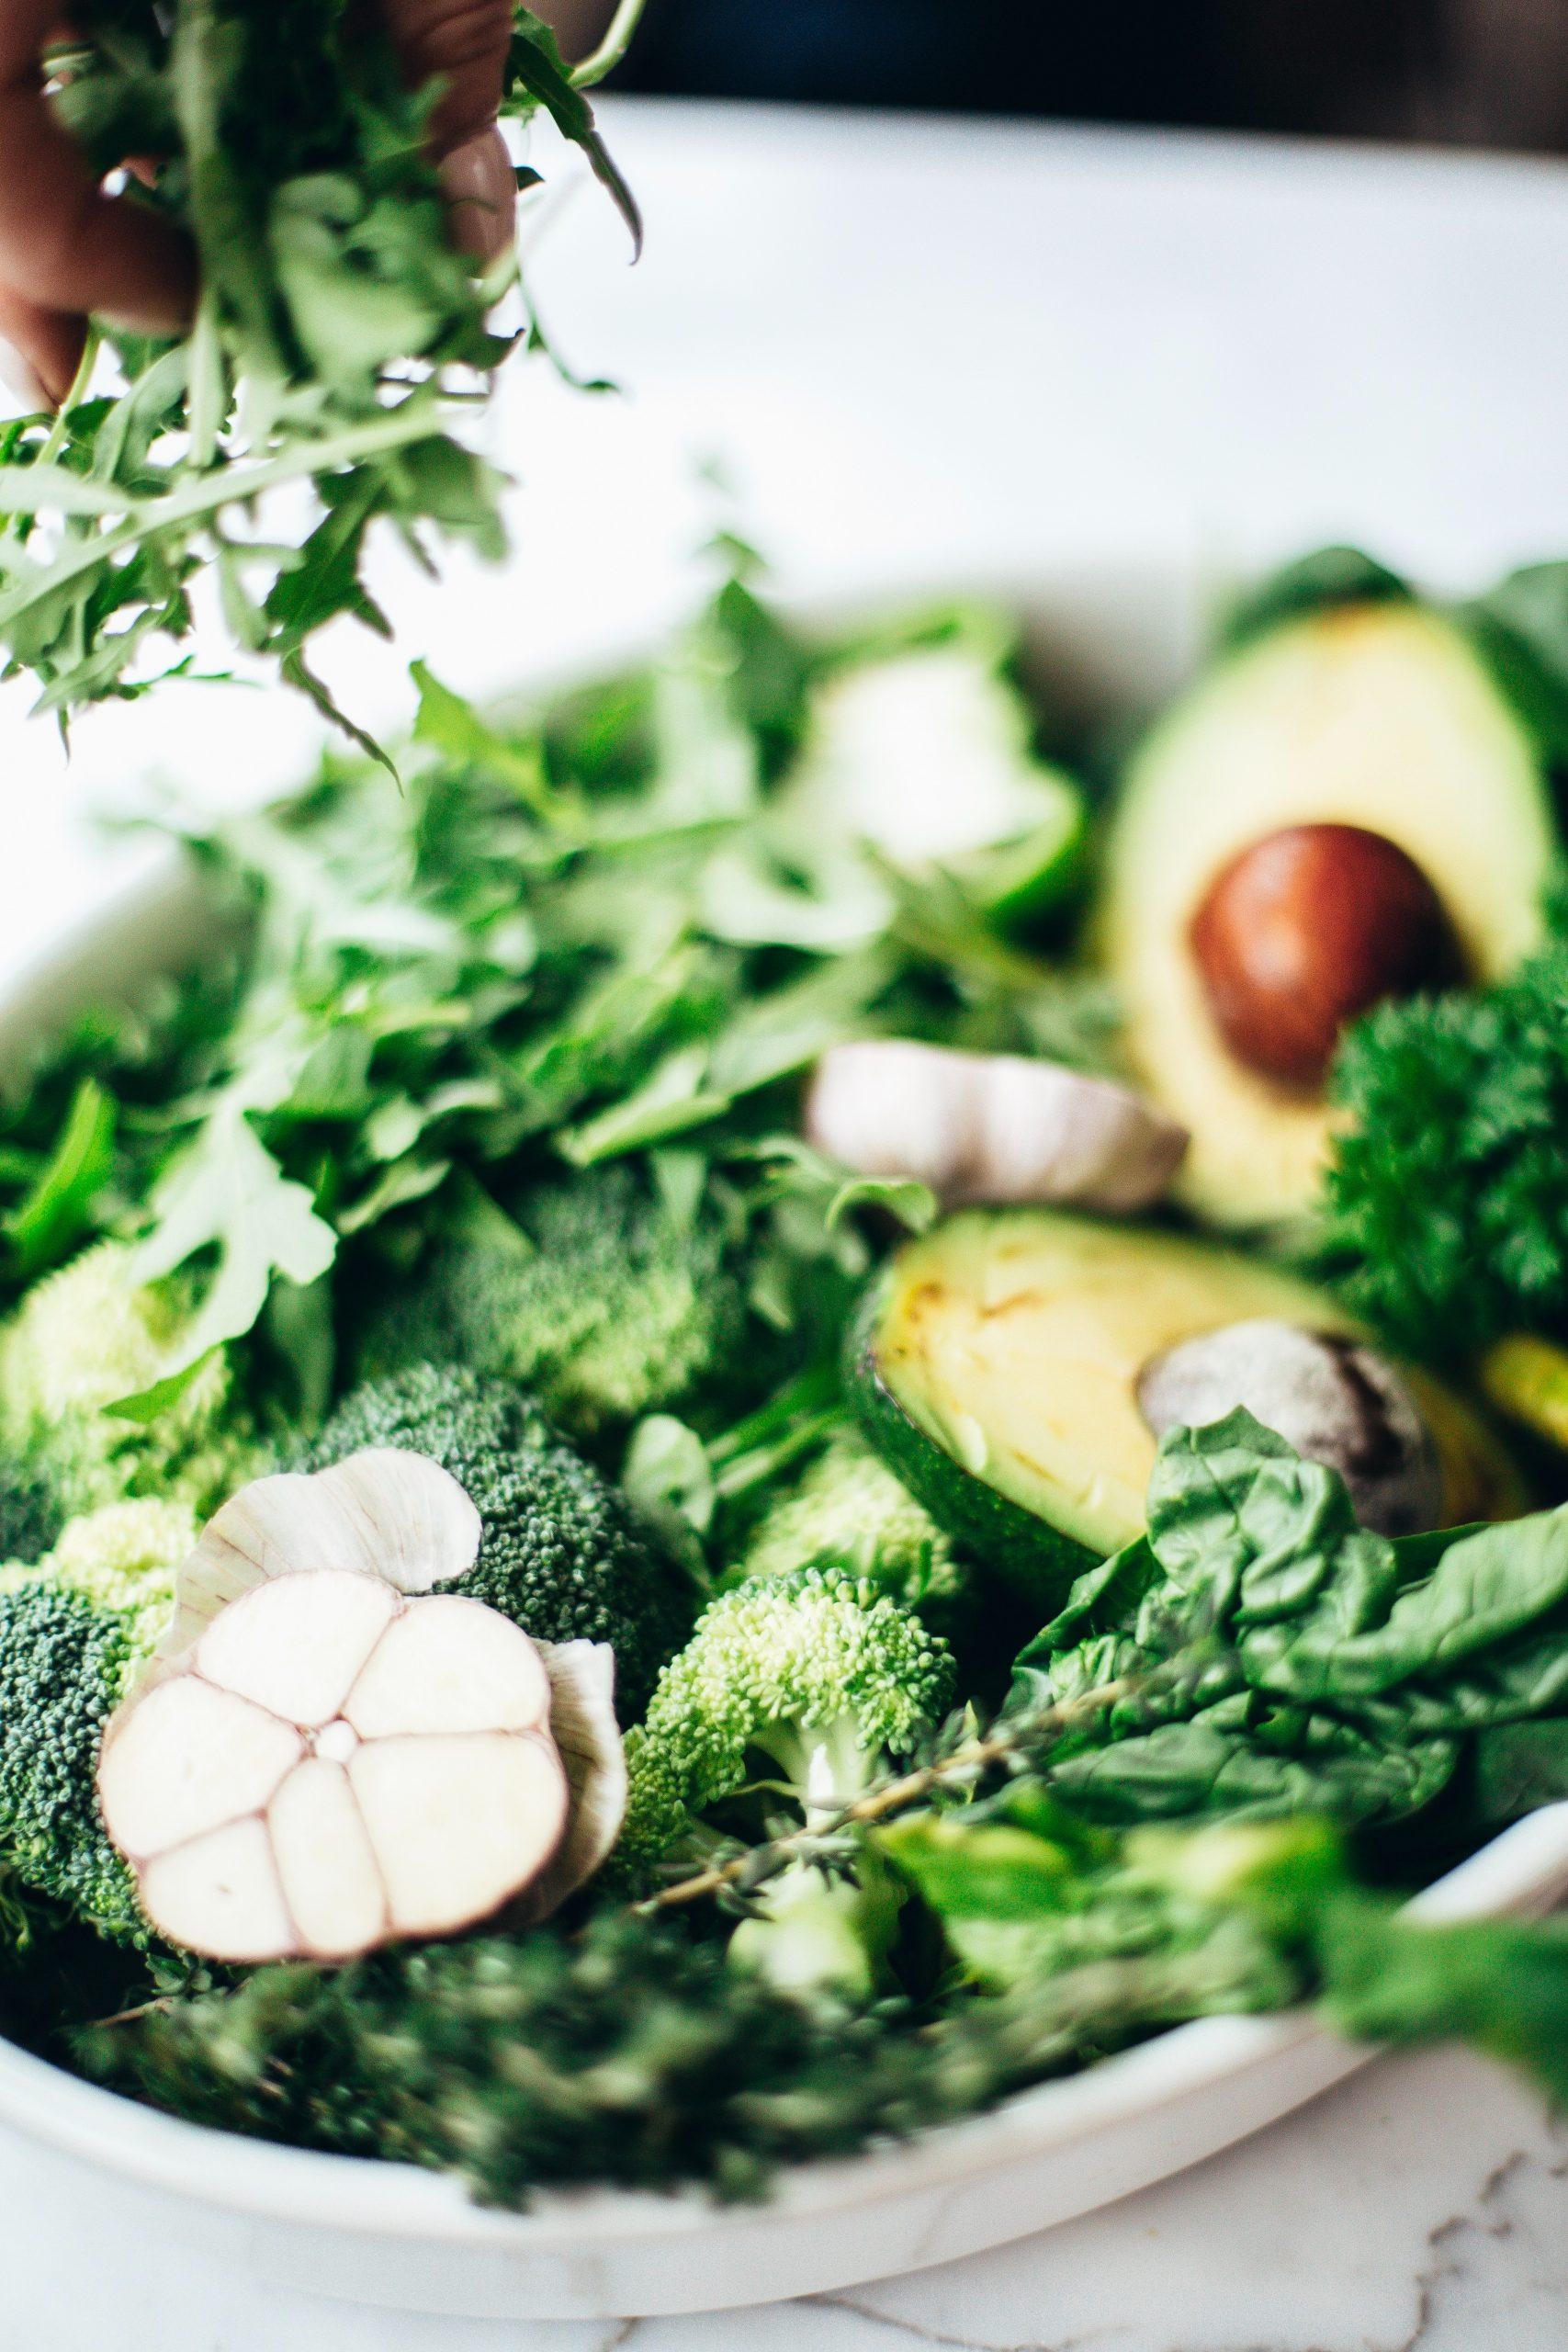 Platter of vegetables.